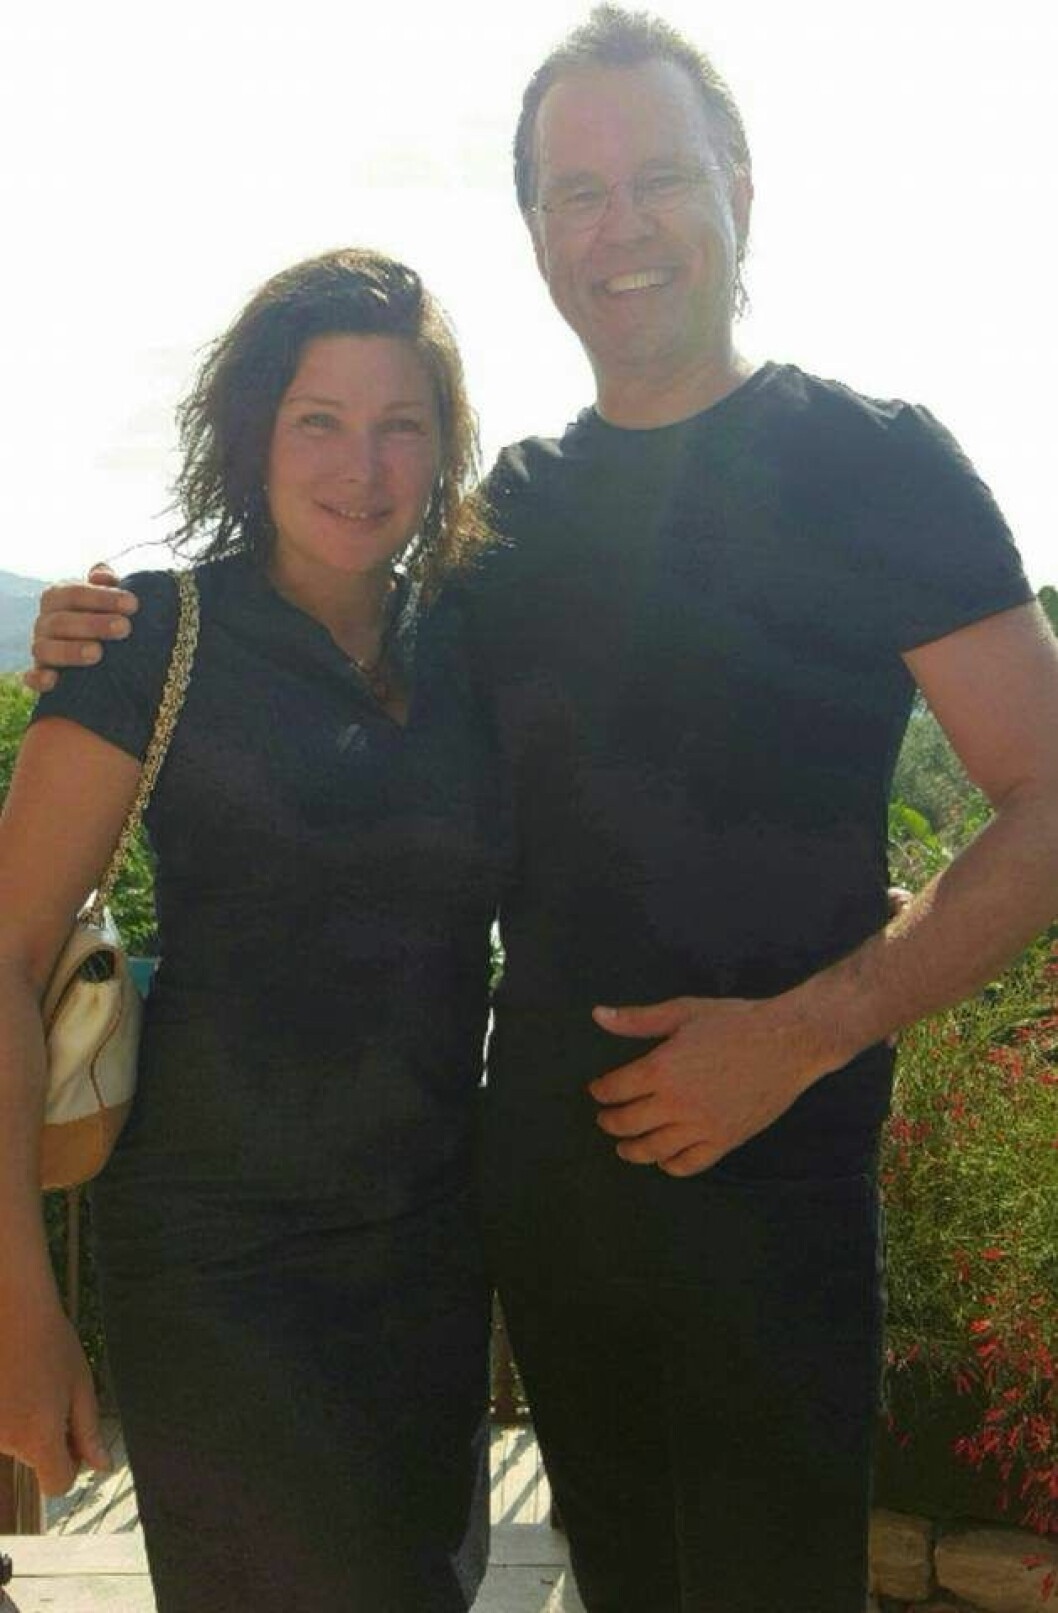 Dominika Peczynski och Anders Borg. Foto: Privat